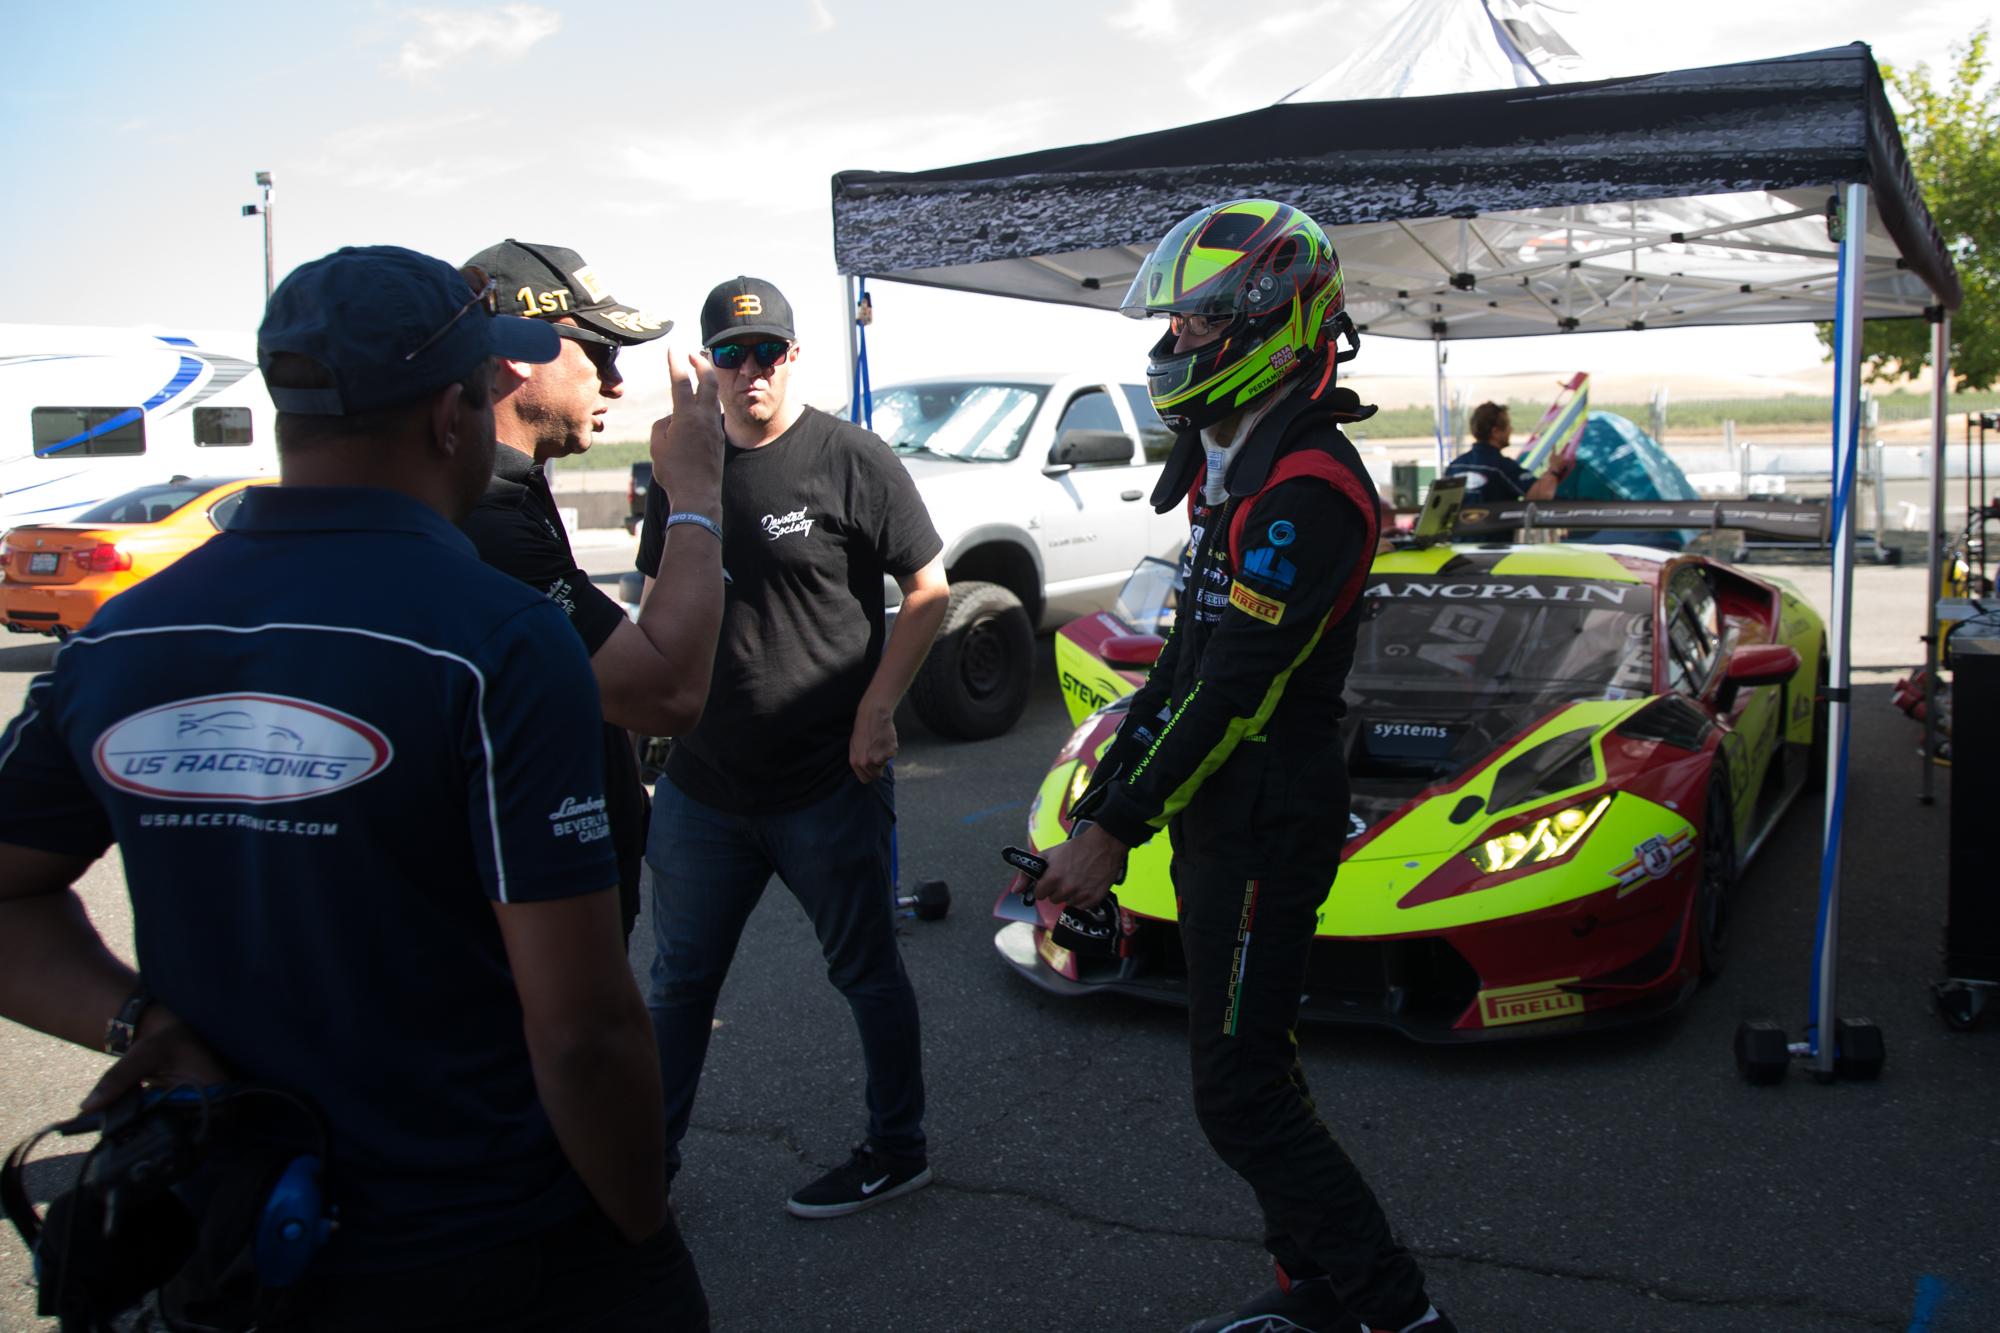 Steven-Racing-20171007-45359.jpg